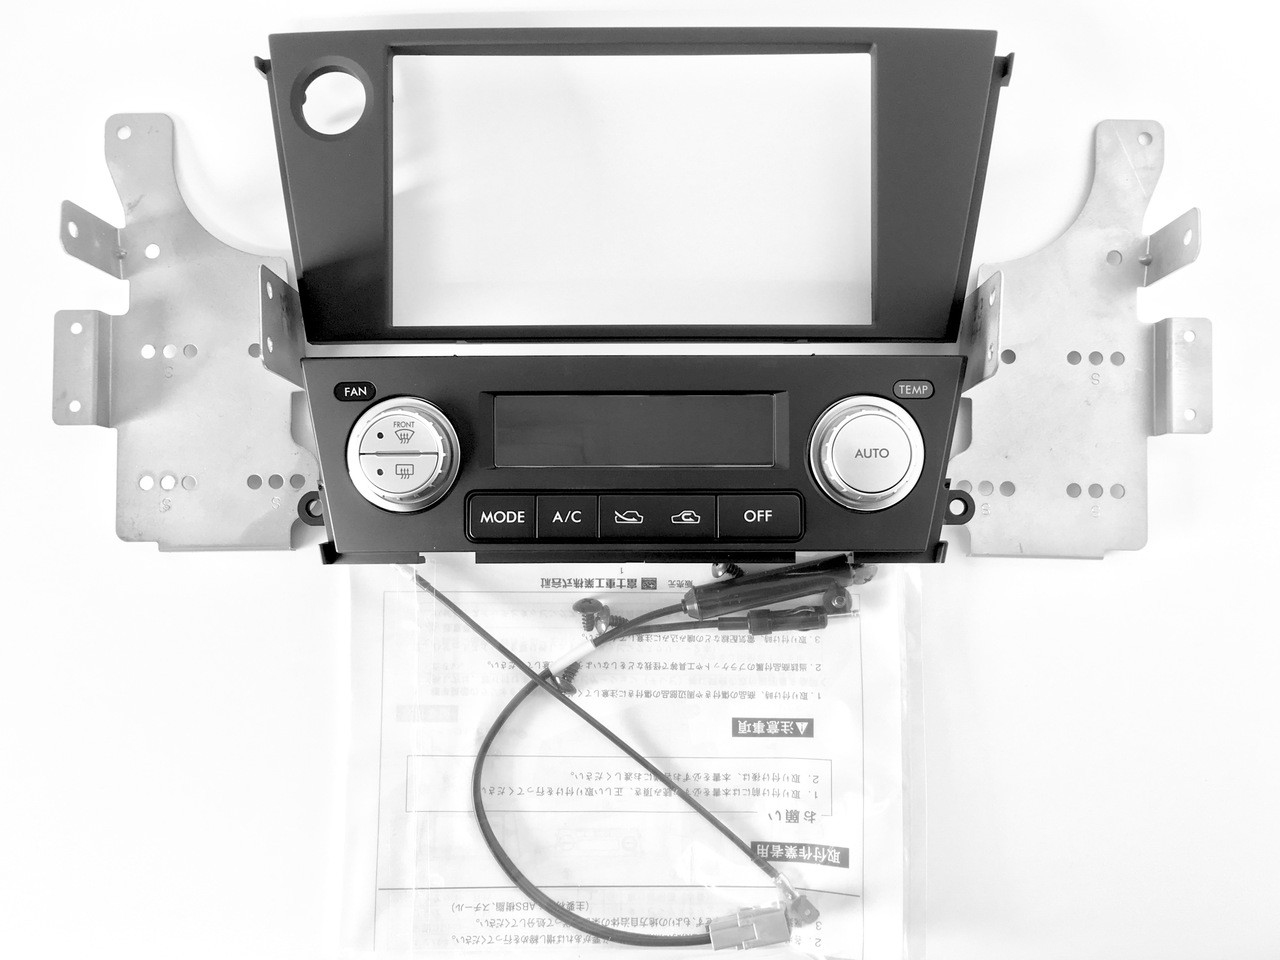 Subaru JDM H6217AG910 Single Zone AV Panel set contents at AVOJDM